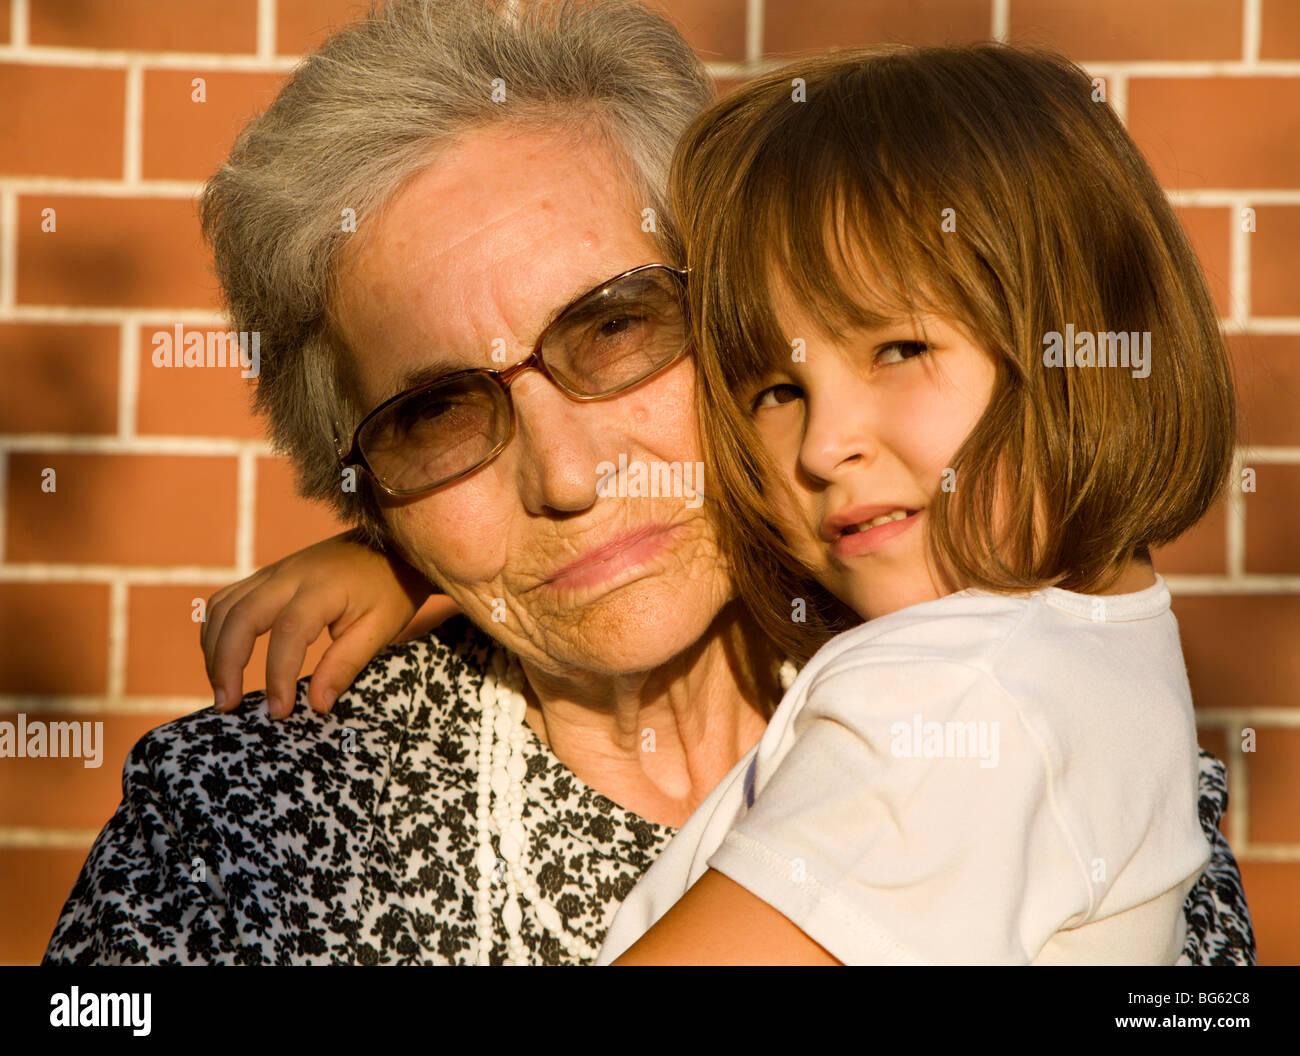 grandmother and grandchild - Stock Image